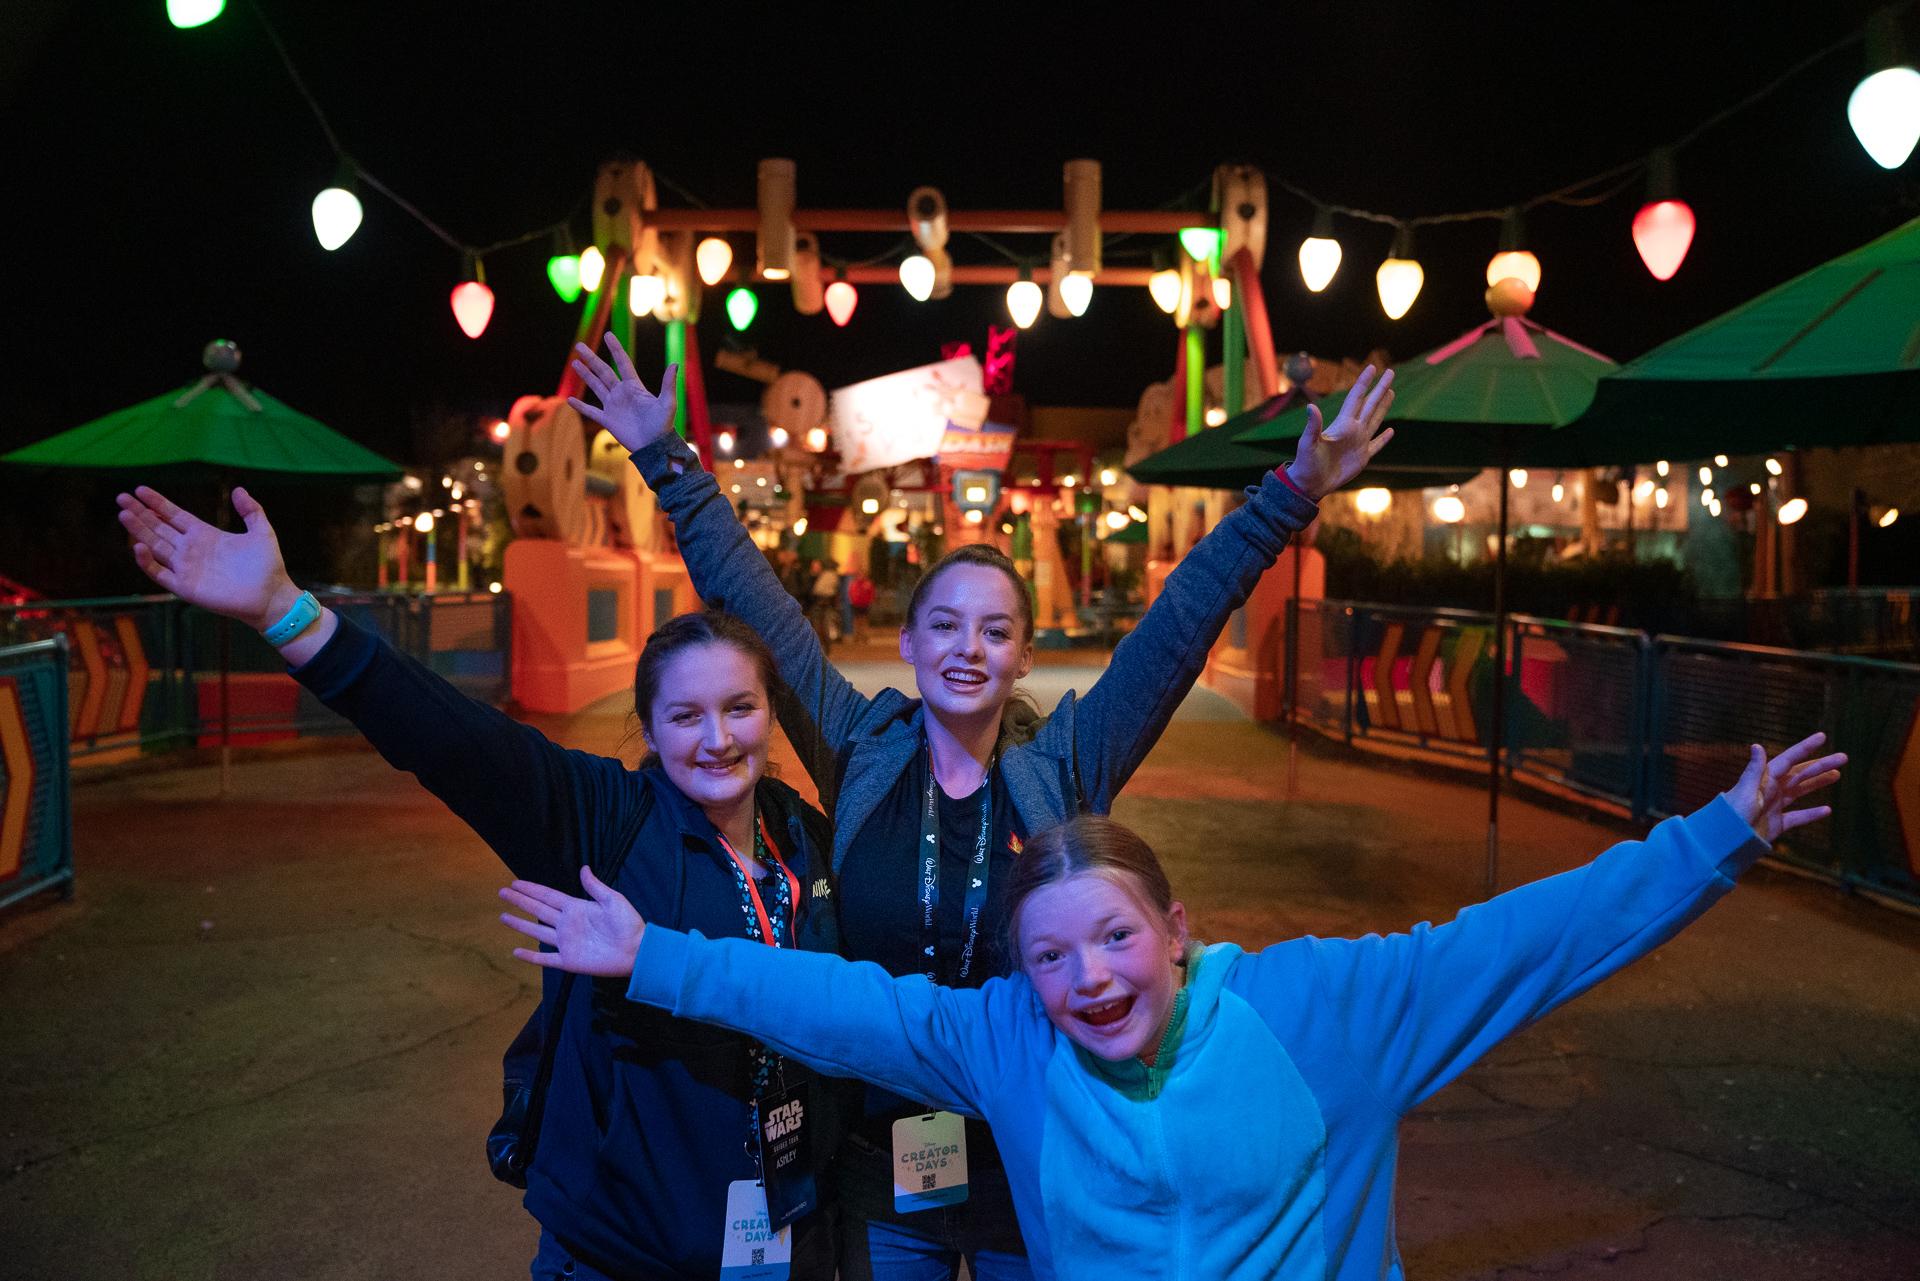 Three girls posing at the entrance to Toy Story Land at Disney's Hollywood Studios at Walt Disney World